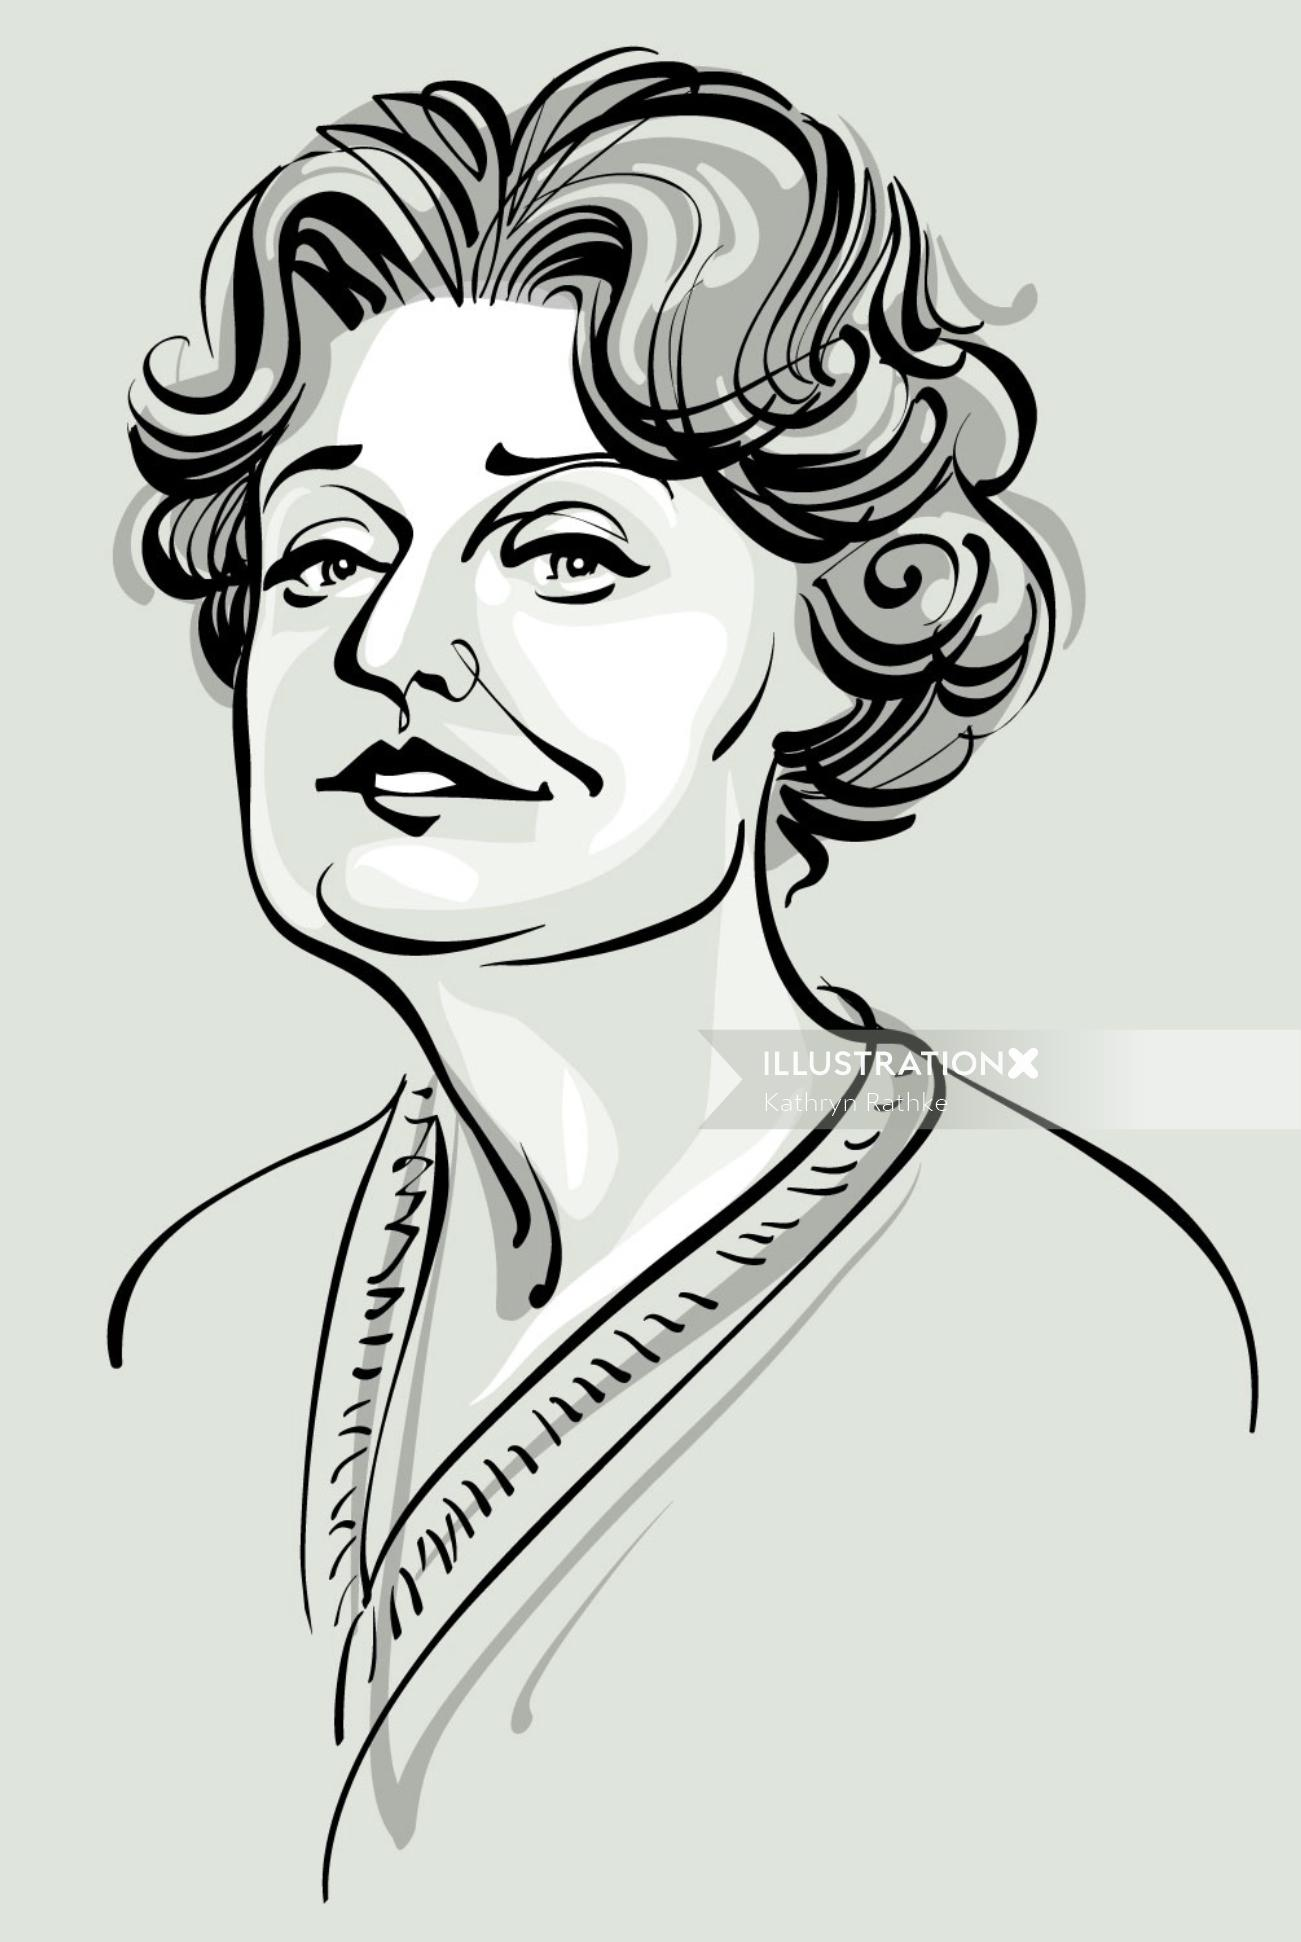 Muriel spark line art by Seattle based illustrator